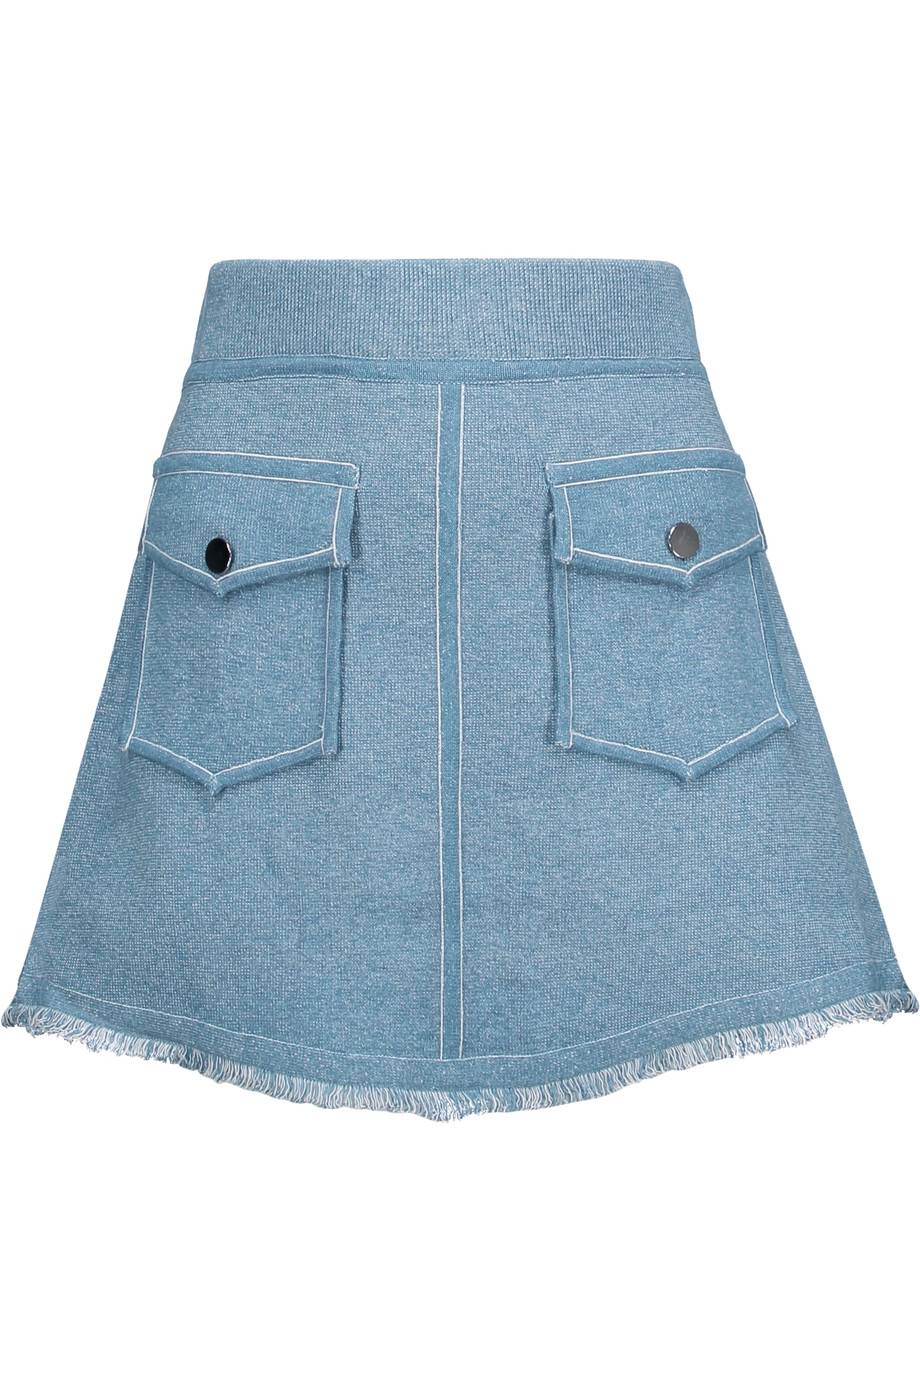 https-::www.theoutnet.com:en-US:Shop:Product:Derek-Lam-10-Crosby:Knitted-cotton-mini-skirt:989414.jpg